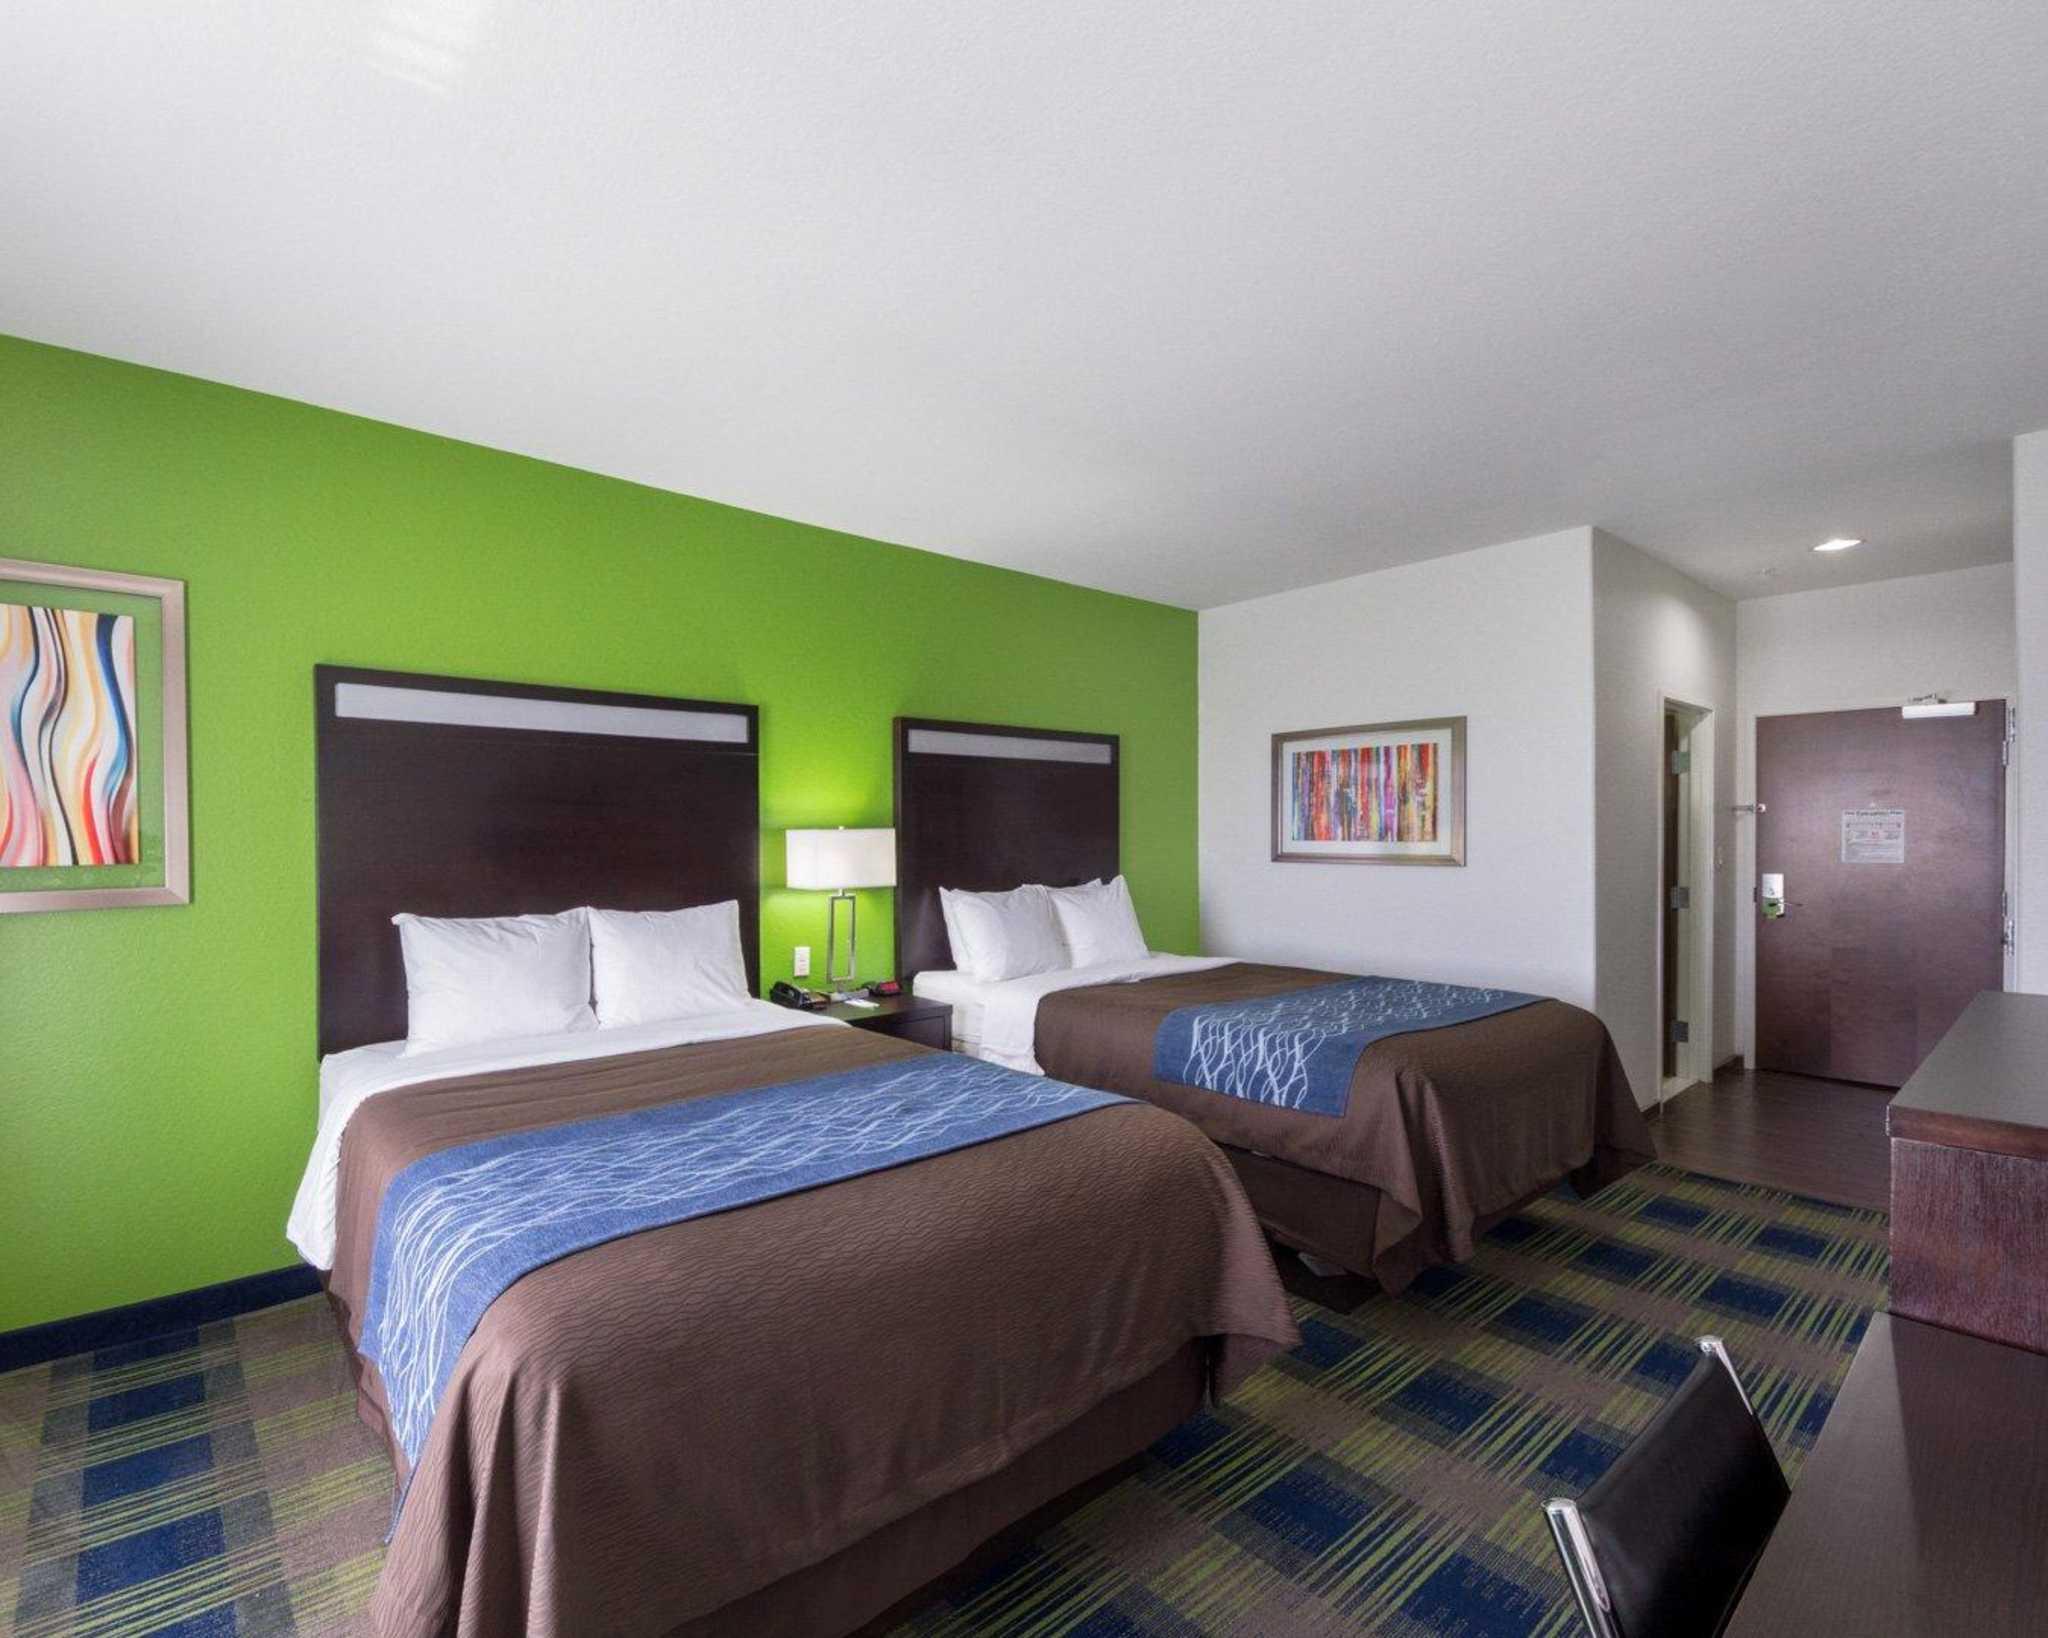 Comfort Inn & Suites image 5